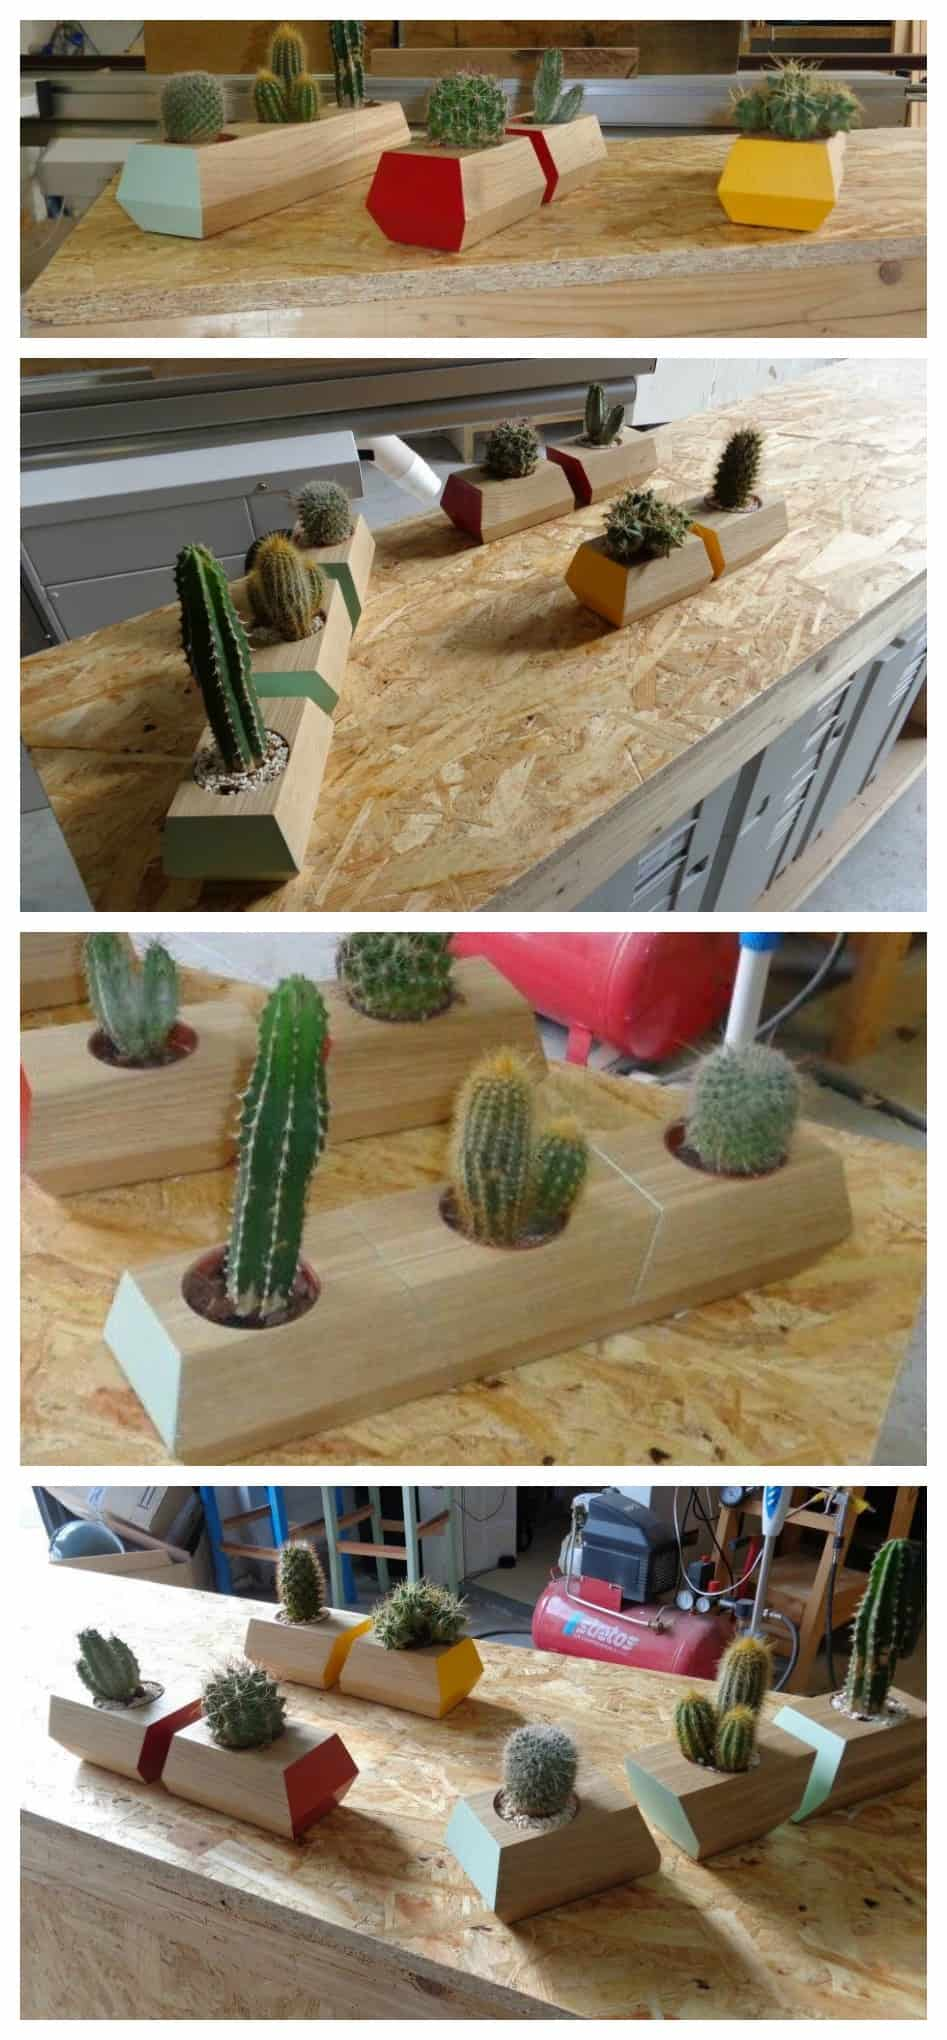 Vasi In Legno Fai Da Te.Cactus Mania Video Tutorial Per Vasetti Diy Di Legno Fai Da Te